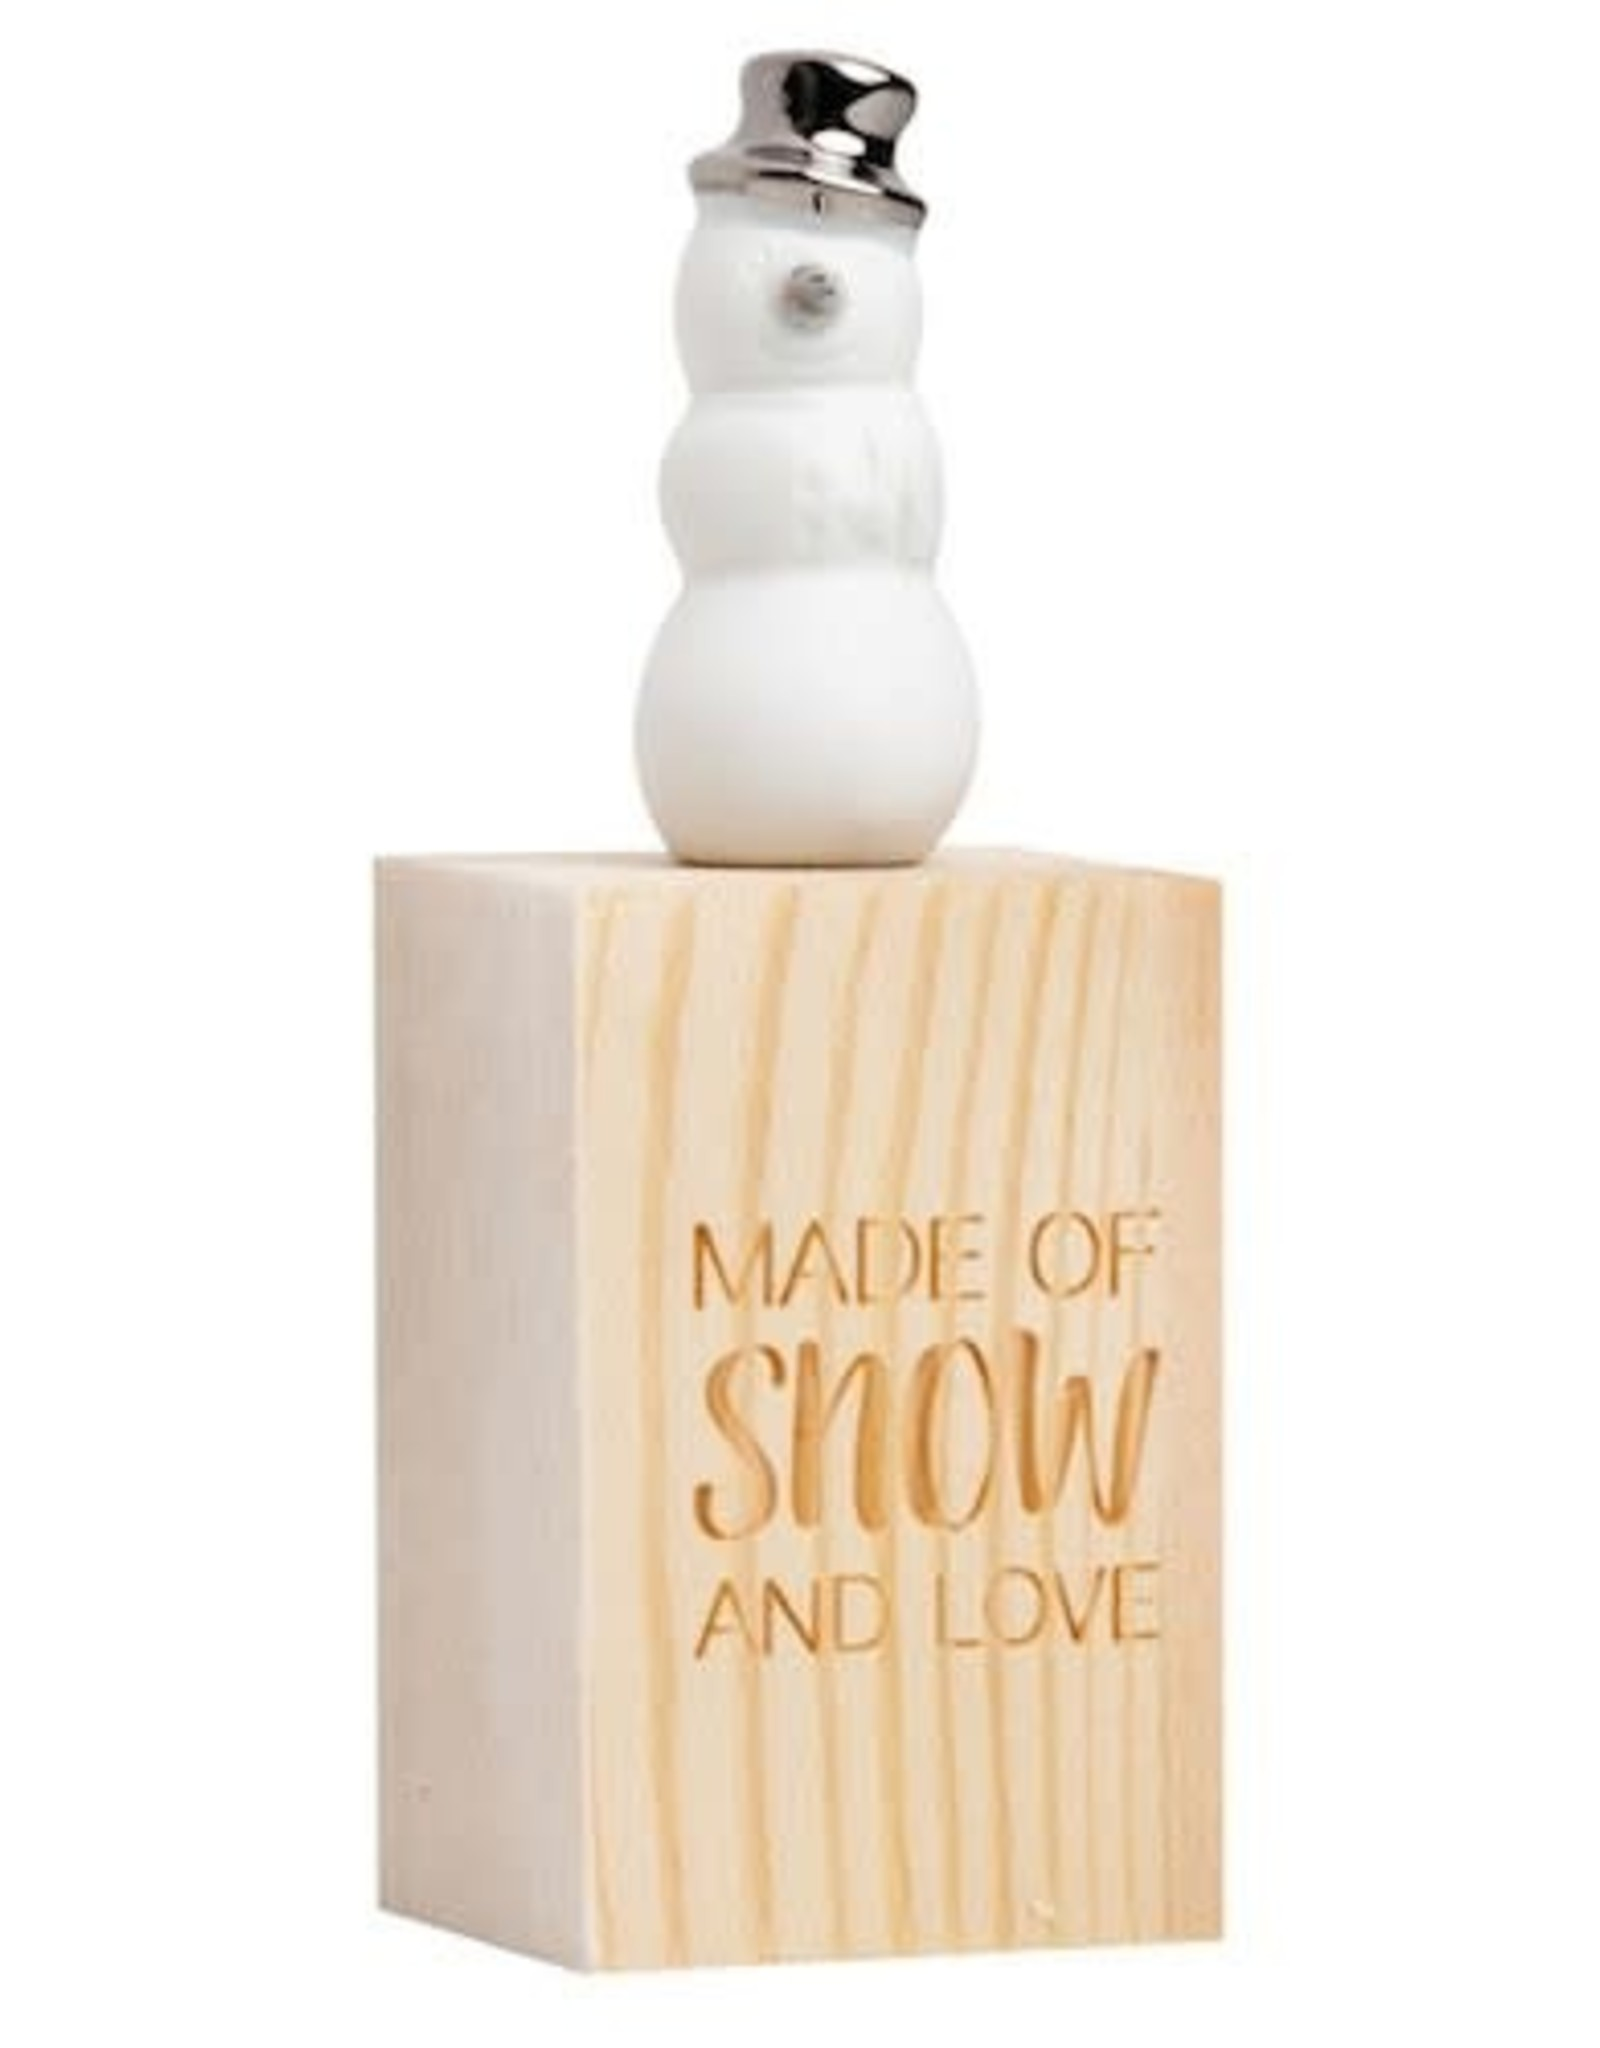 Räder Geluksdoosje Made of Love and Snow - Räder